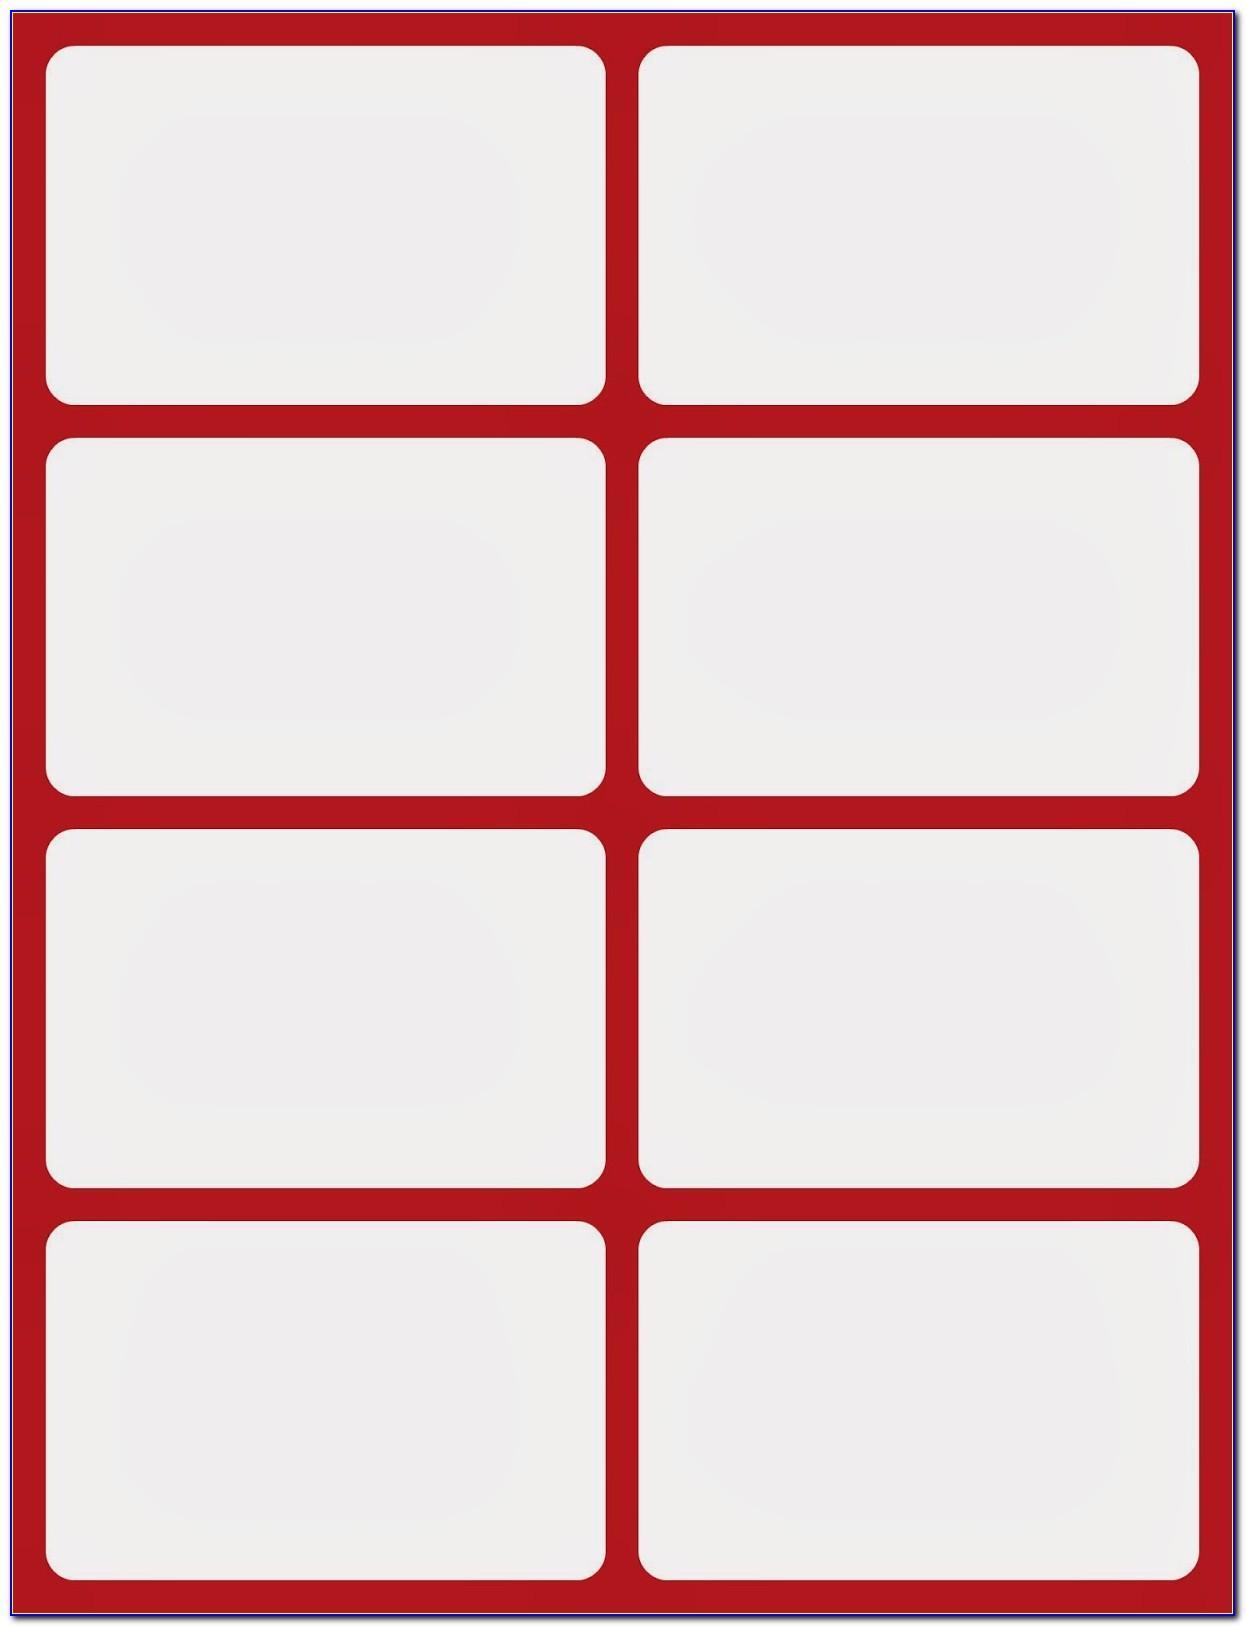 Blank Flash Card Template Word